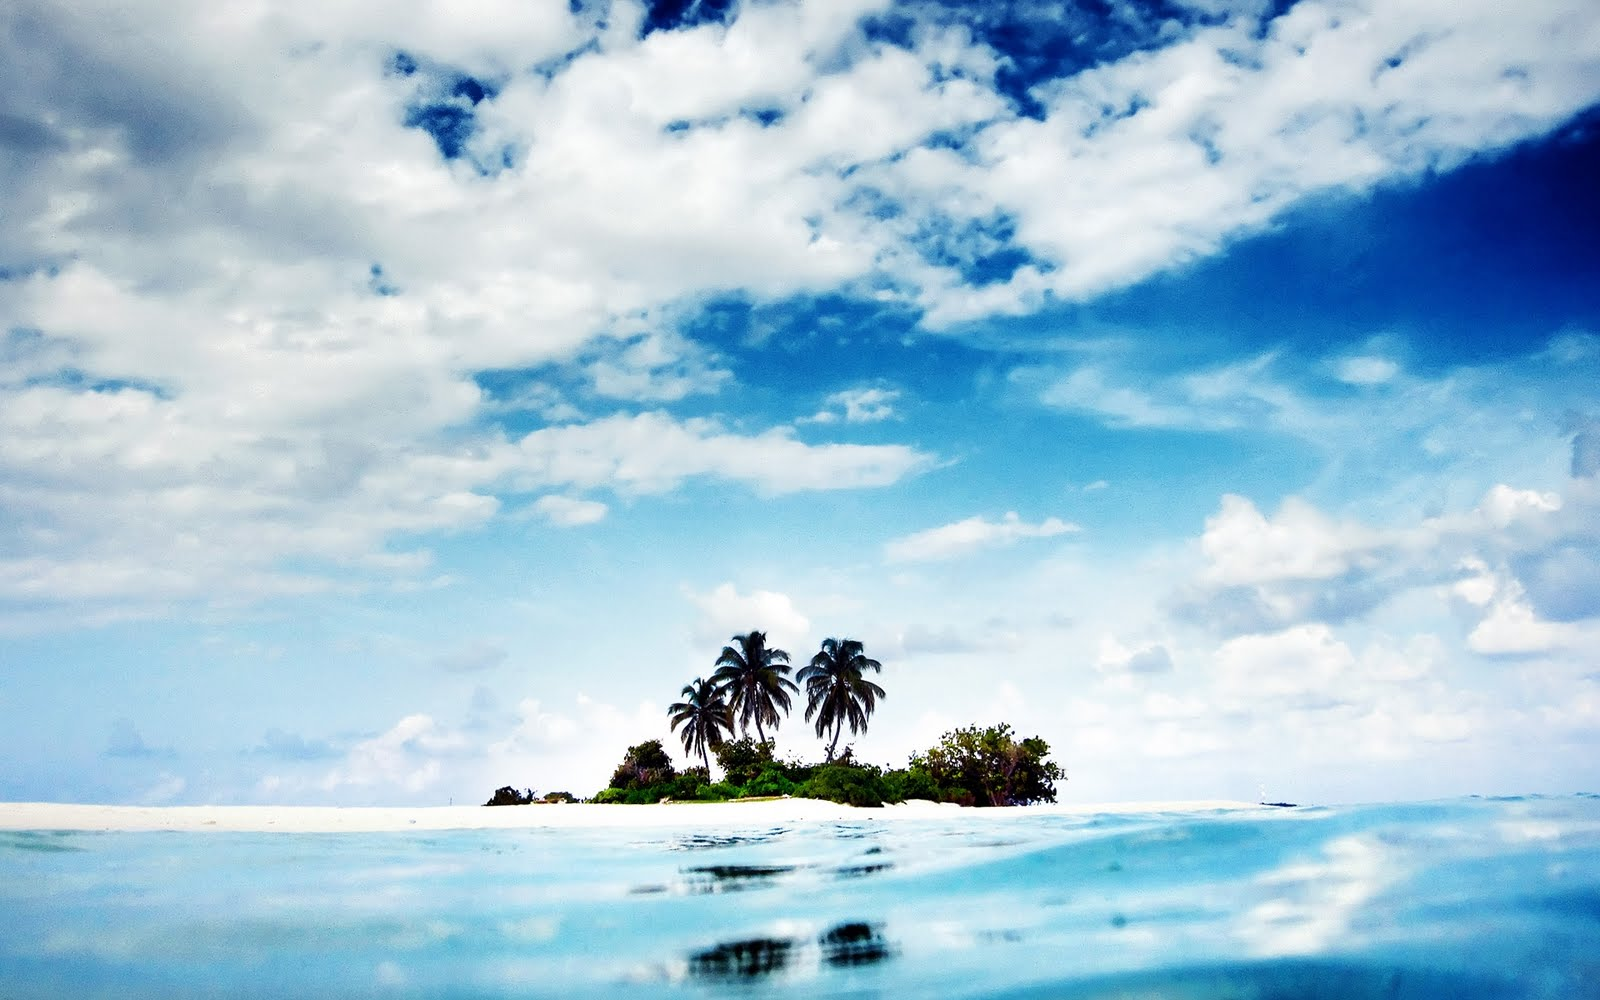 Isla de palma perdida - Lost palm island